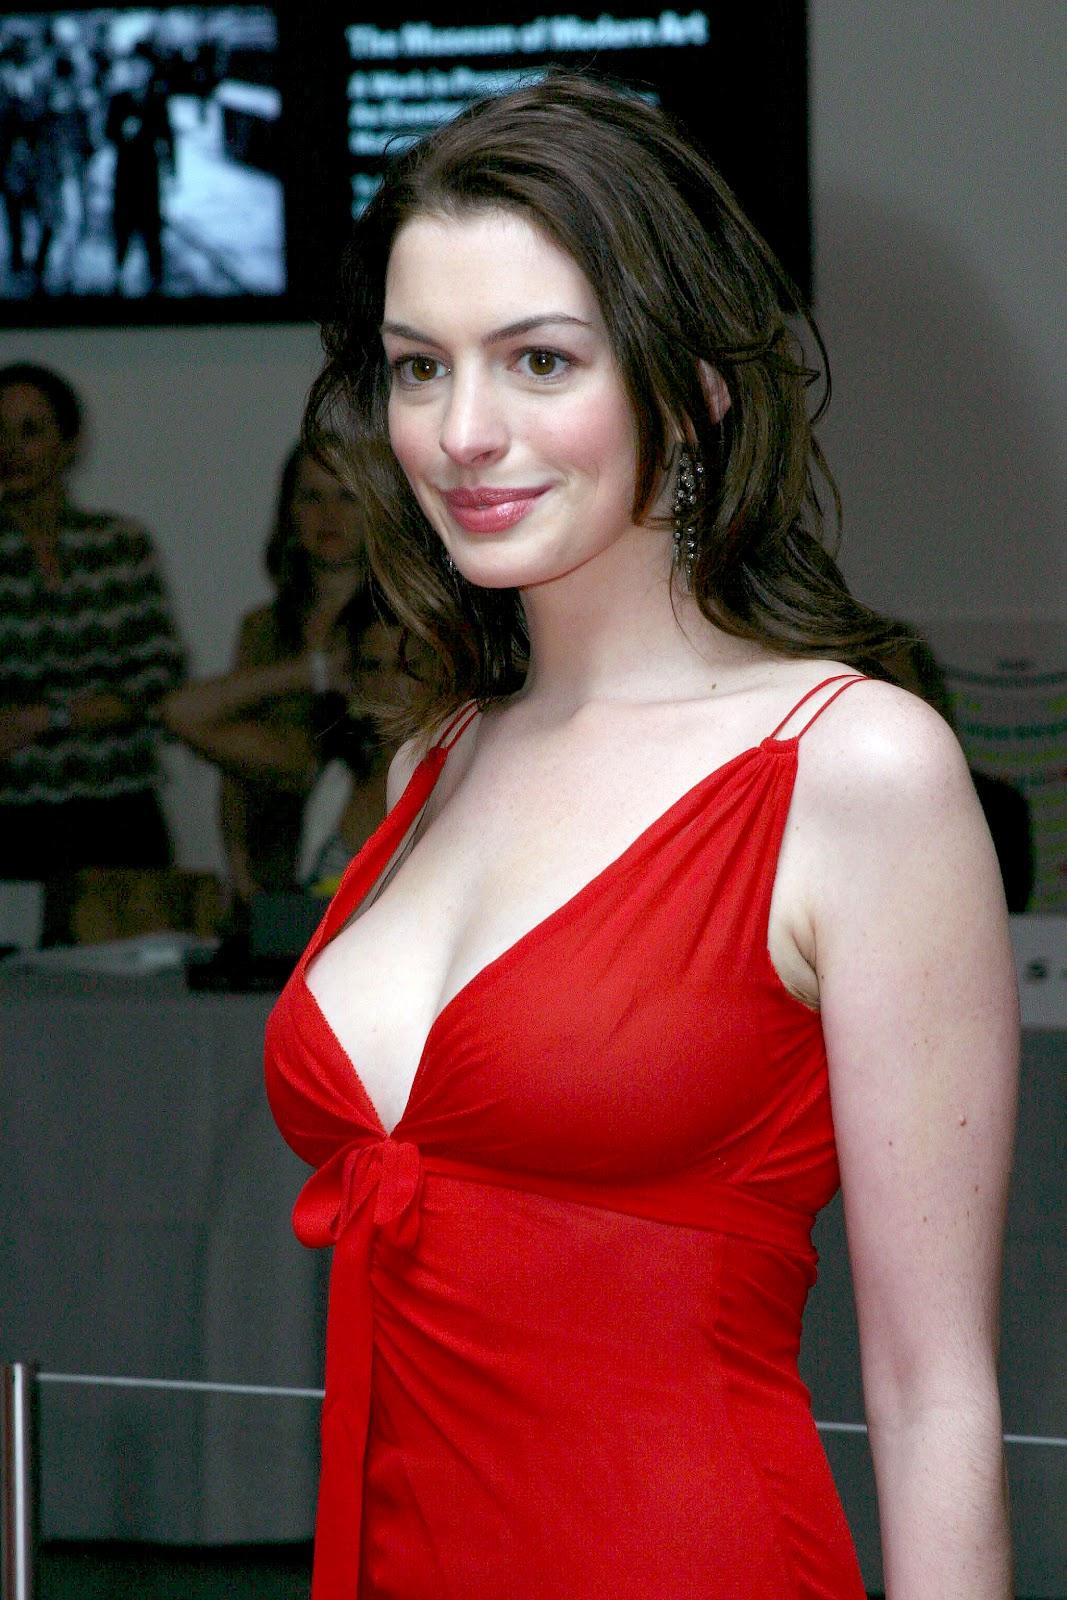 boobs Anne hathaway hot